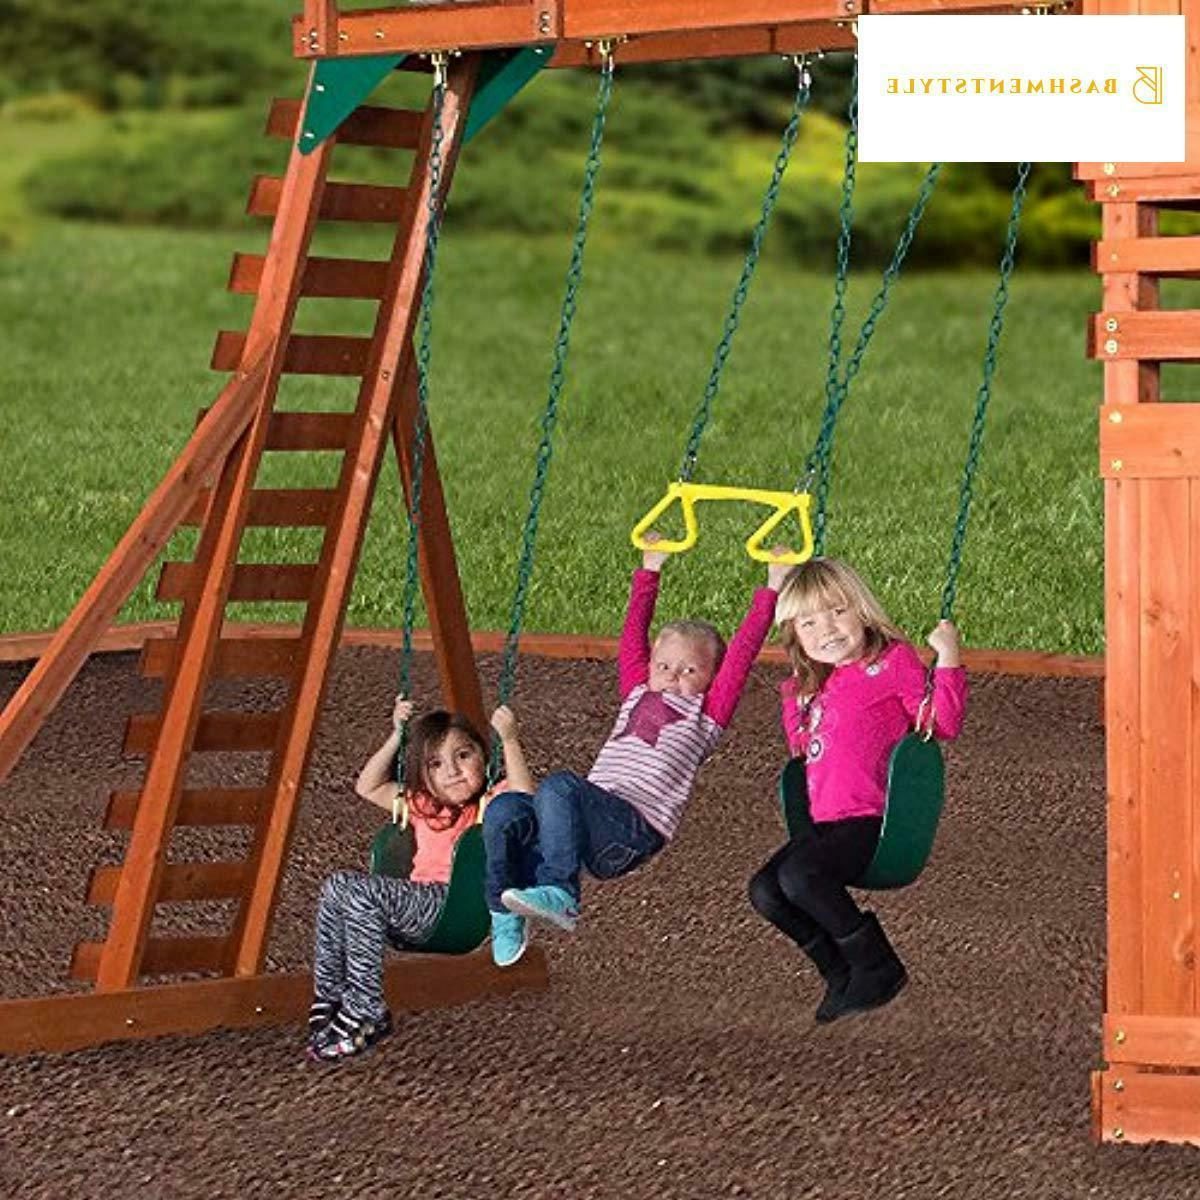 Backyard All Wood Playset Swing